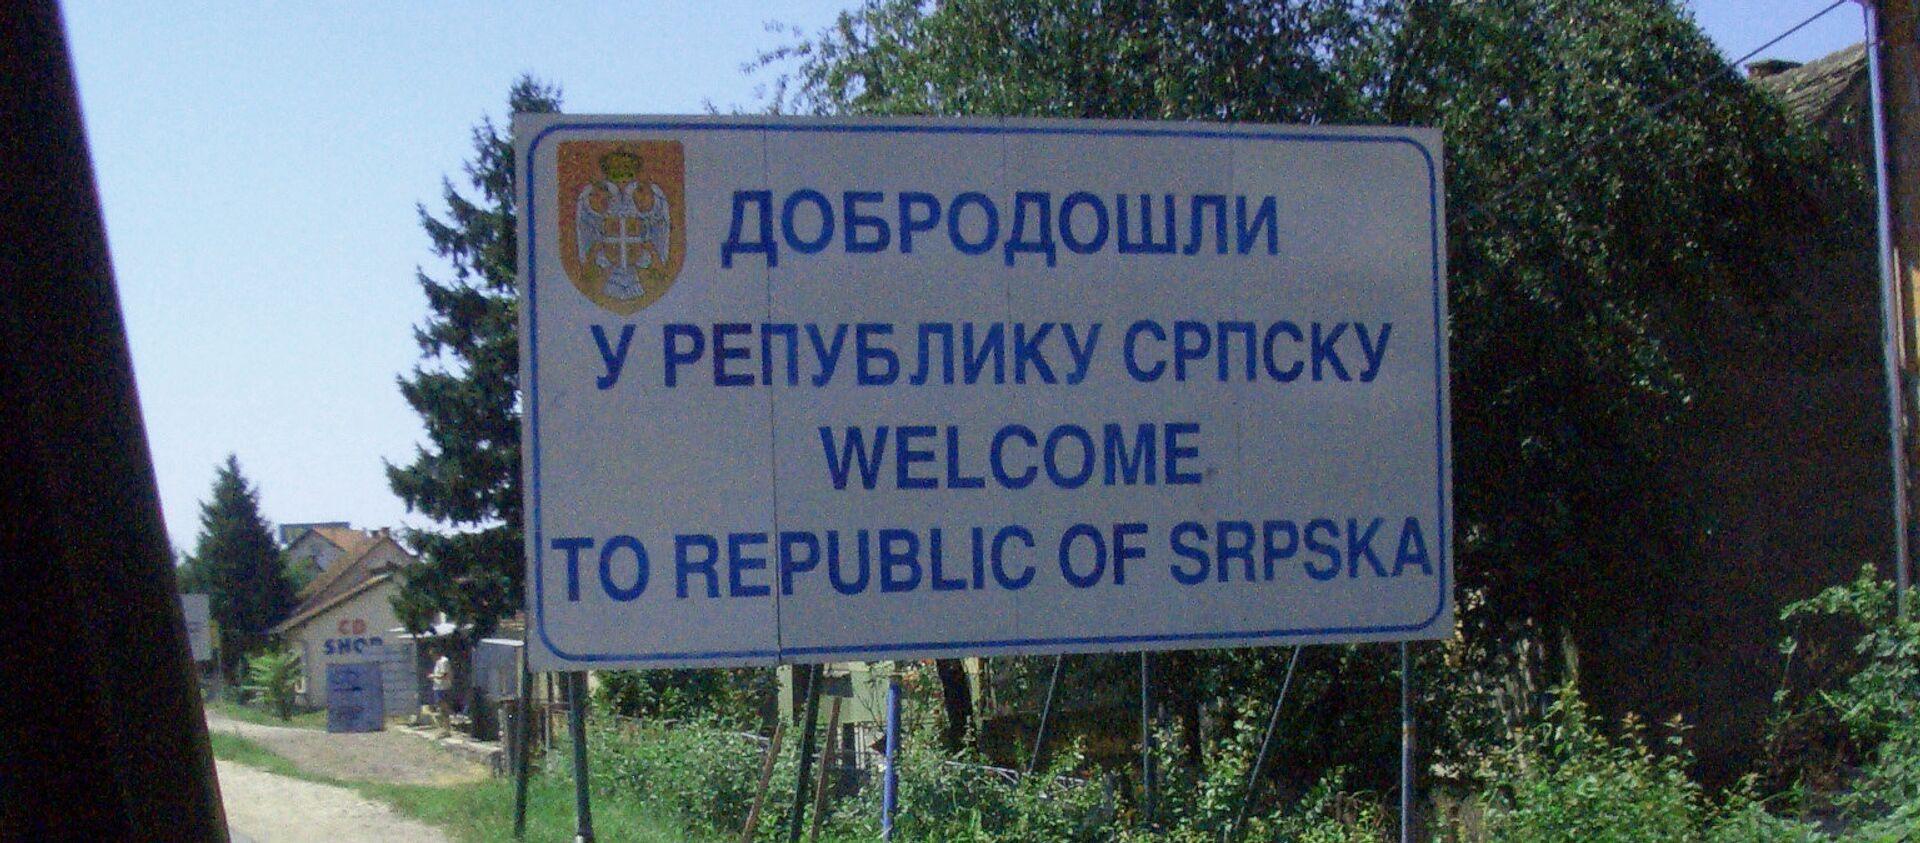 Република српска табла - Sputnik Србија, 1920, 11.03.2021